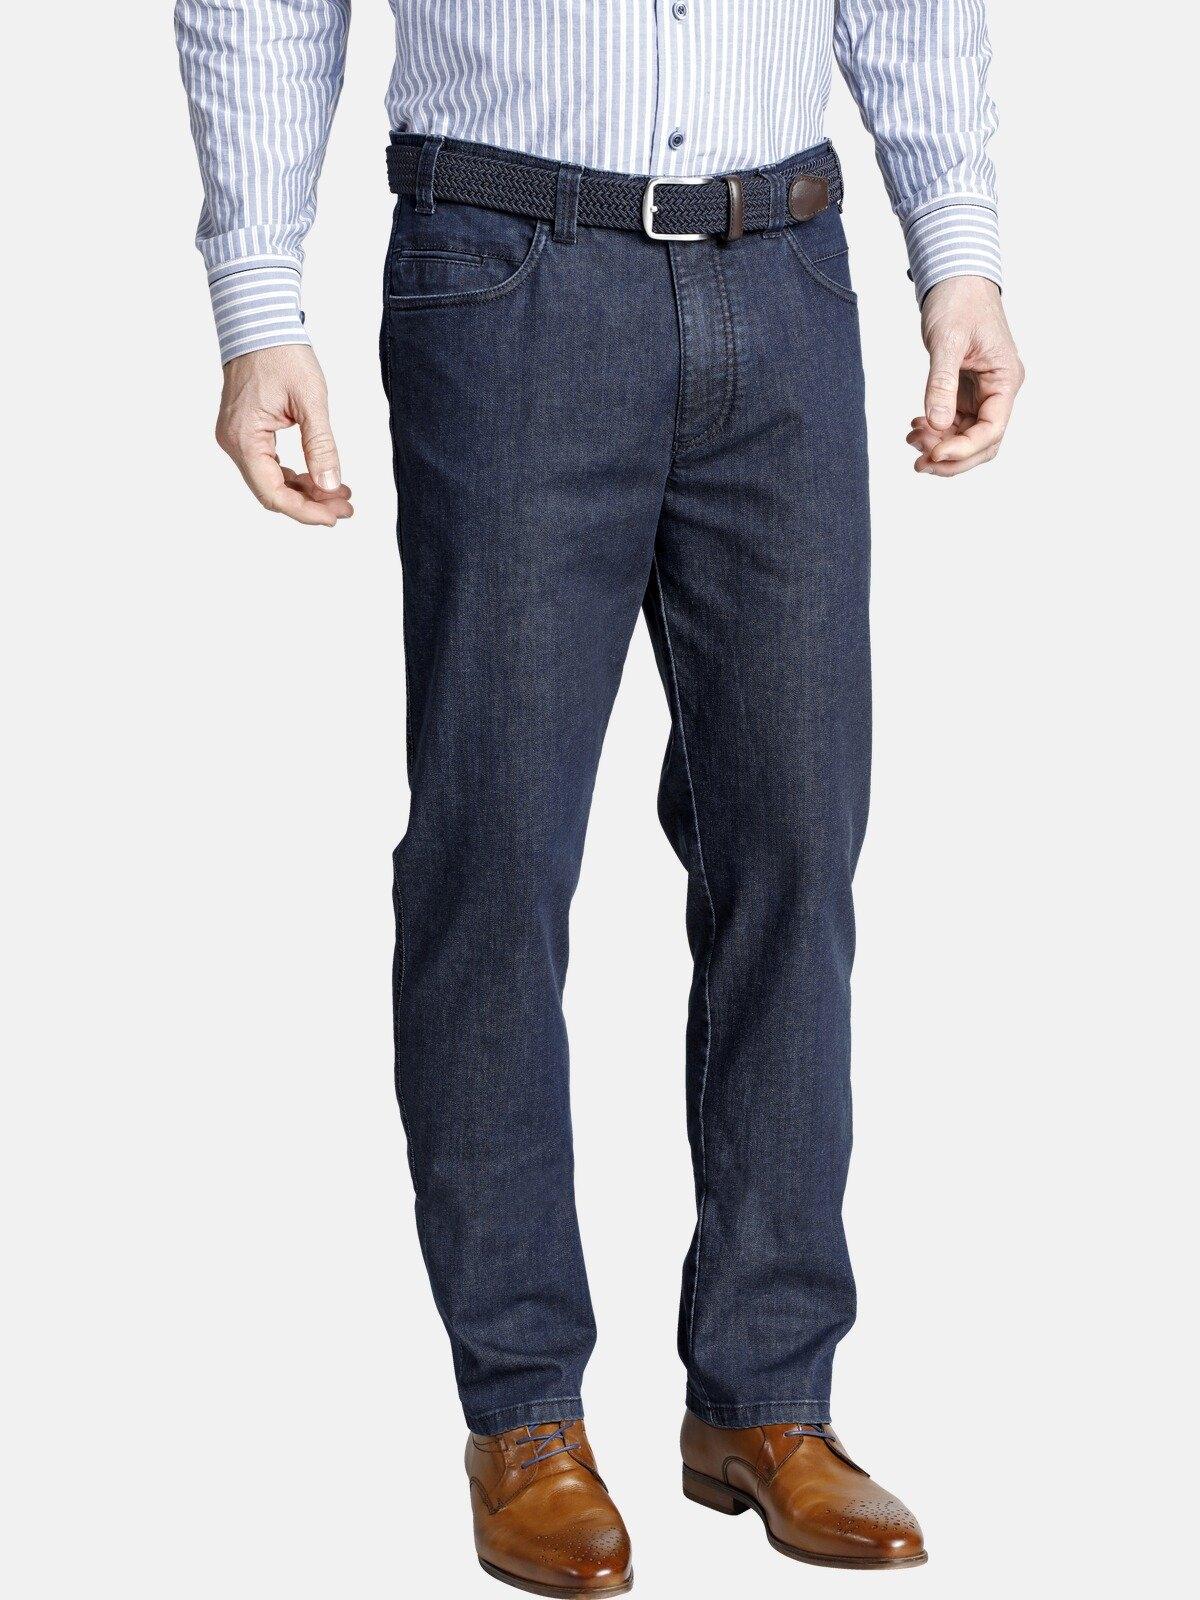 Charles Colby regular fit jeans ANDRED High stretch elastische band bestellen: 30 dagen bedenktijd